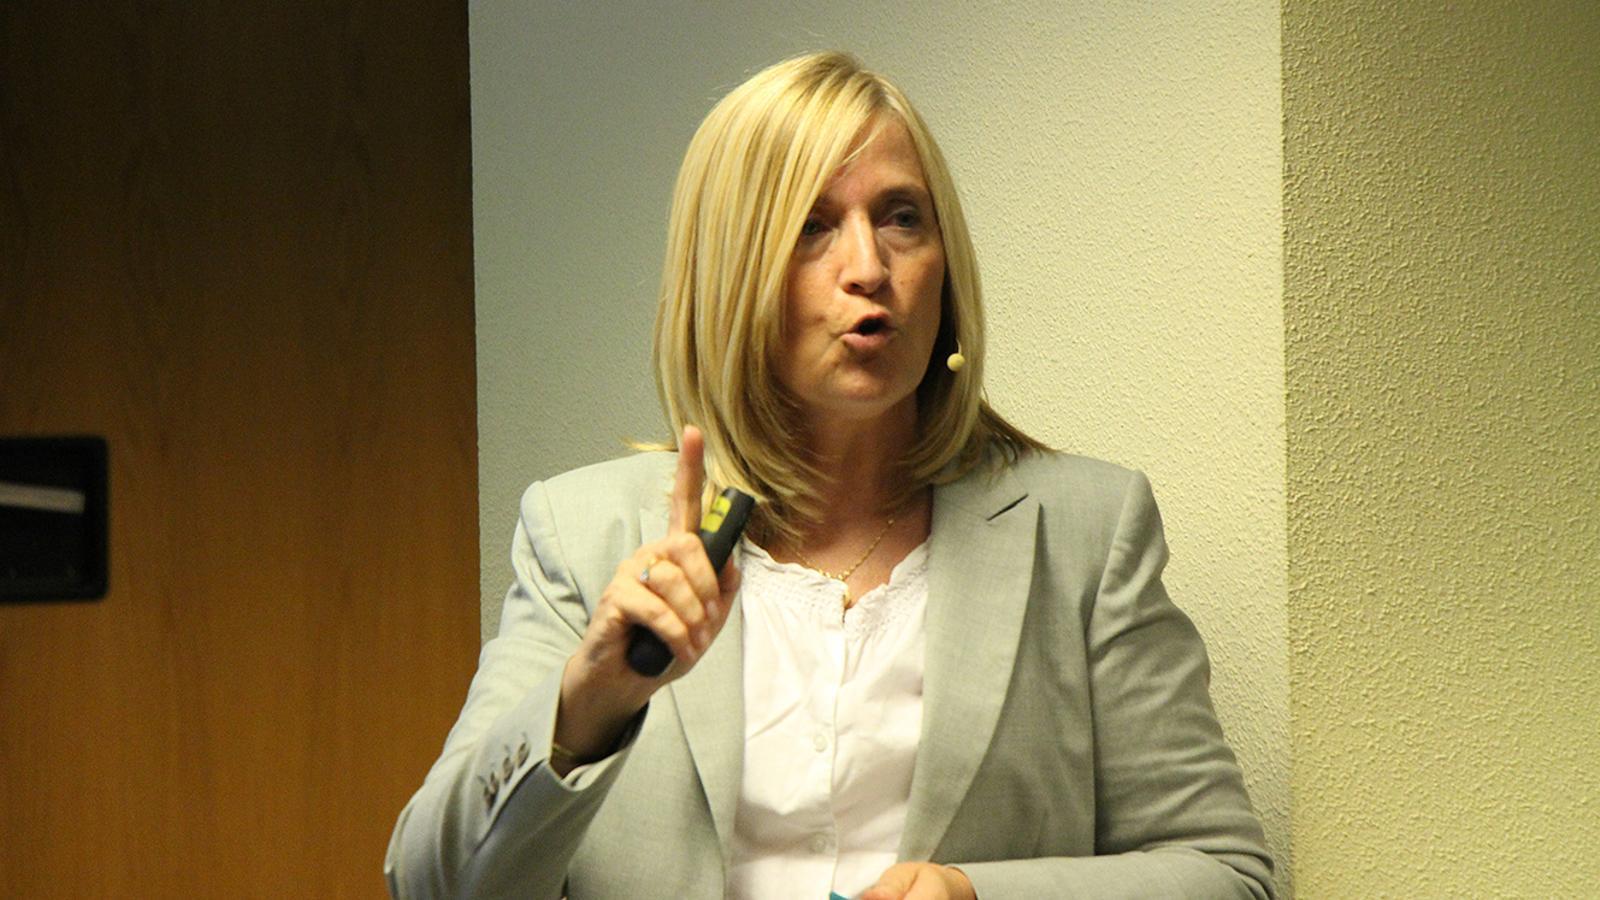 La doctora en psicologia, psicooncòloga i especialista en psicologia clínica, Tània Estapé, durant una conferència. / ARXIU ANA